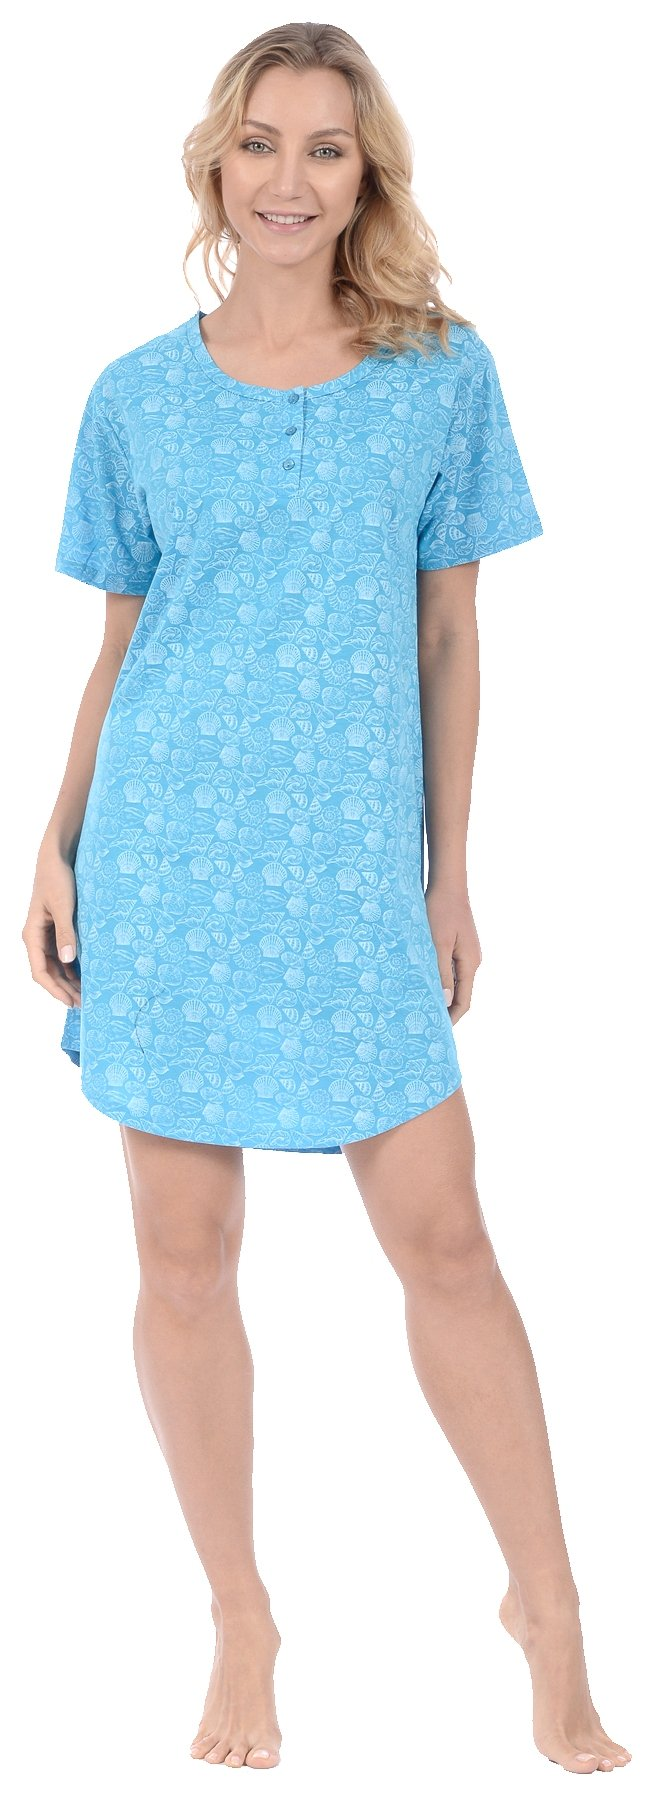 Pink Lady Women's Nightshirt Short Sleeve Loungewear PJ (XXX-Large, Turquoise)